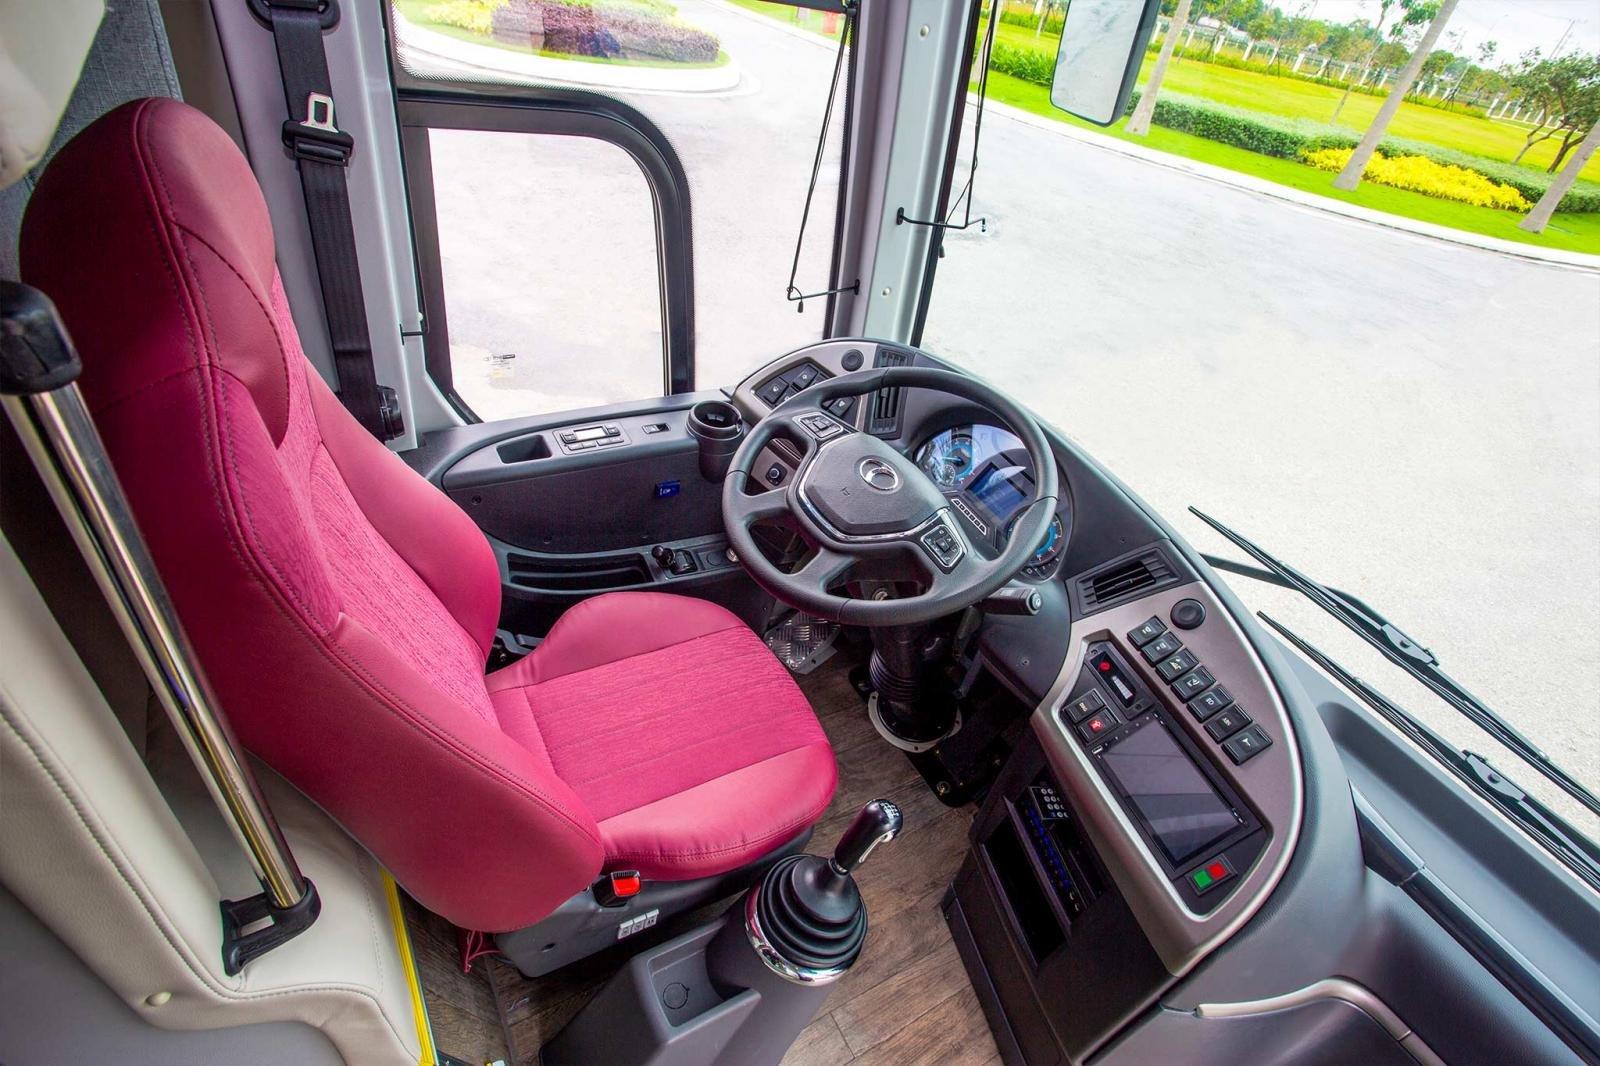 Xe bus Thaco Mobihome Luxury và Thaco Mobihome Premium a8